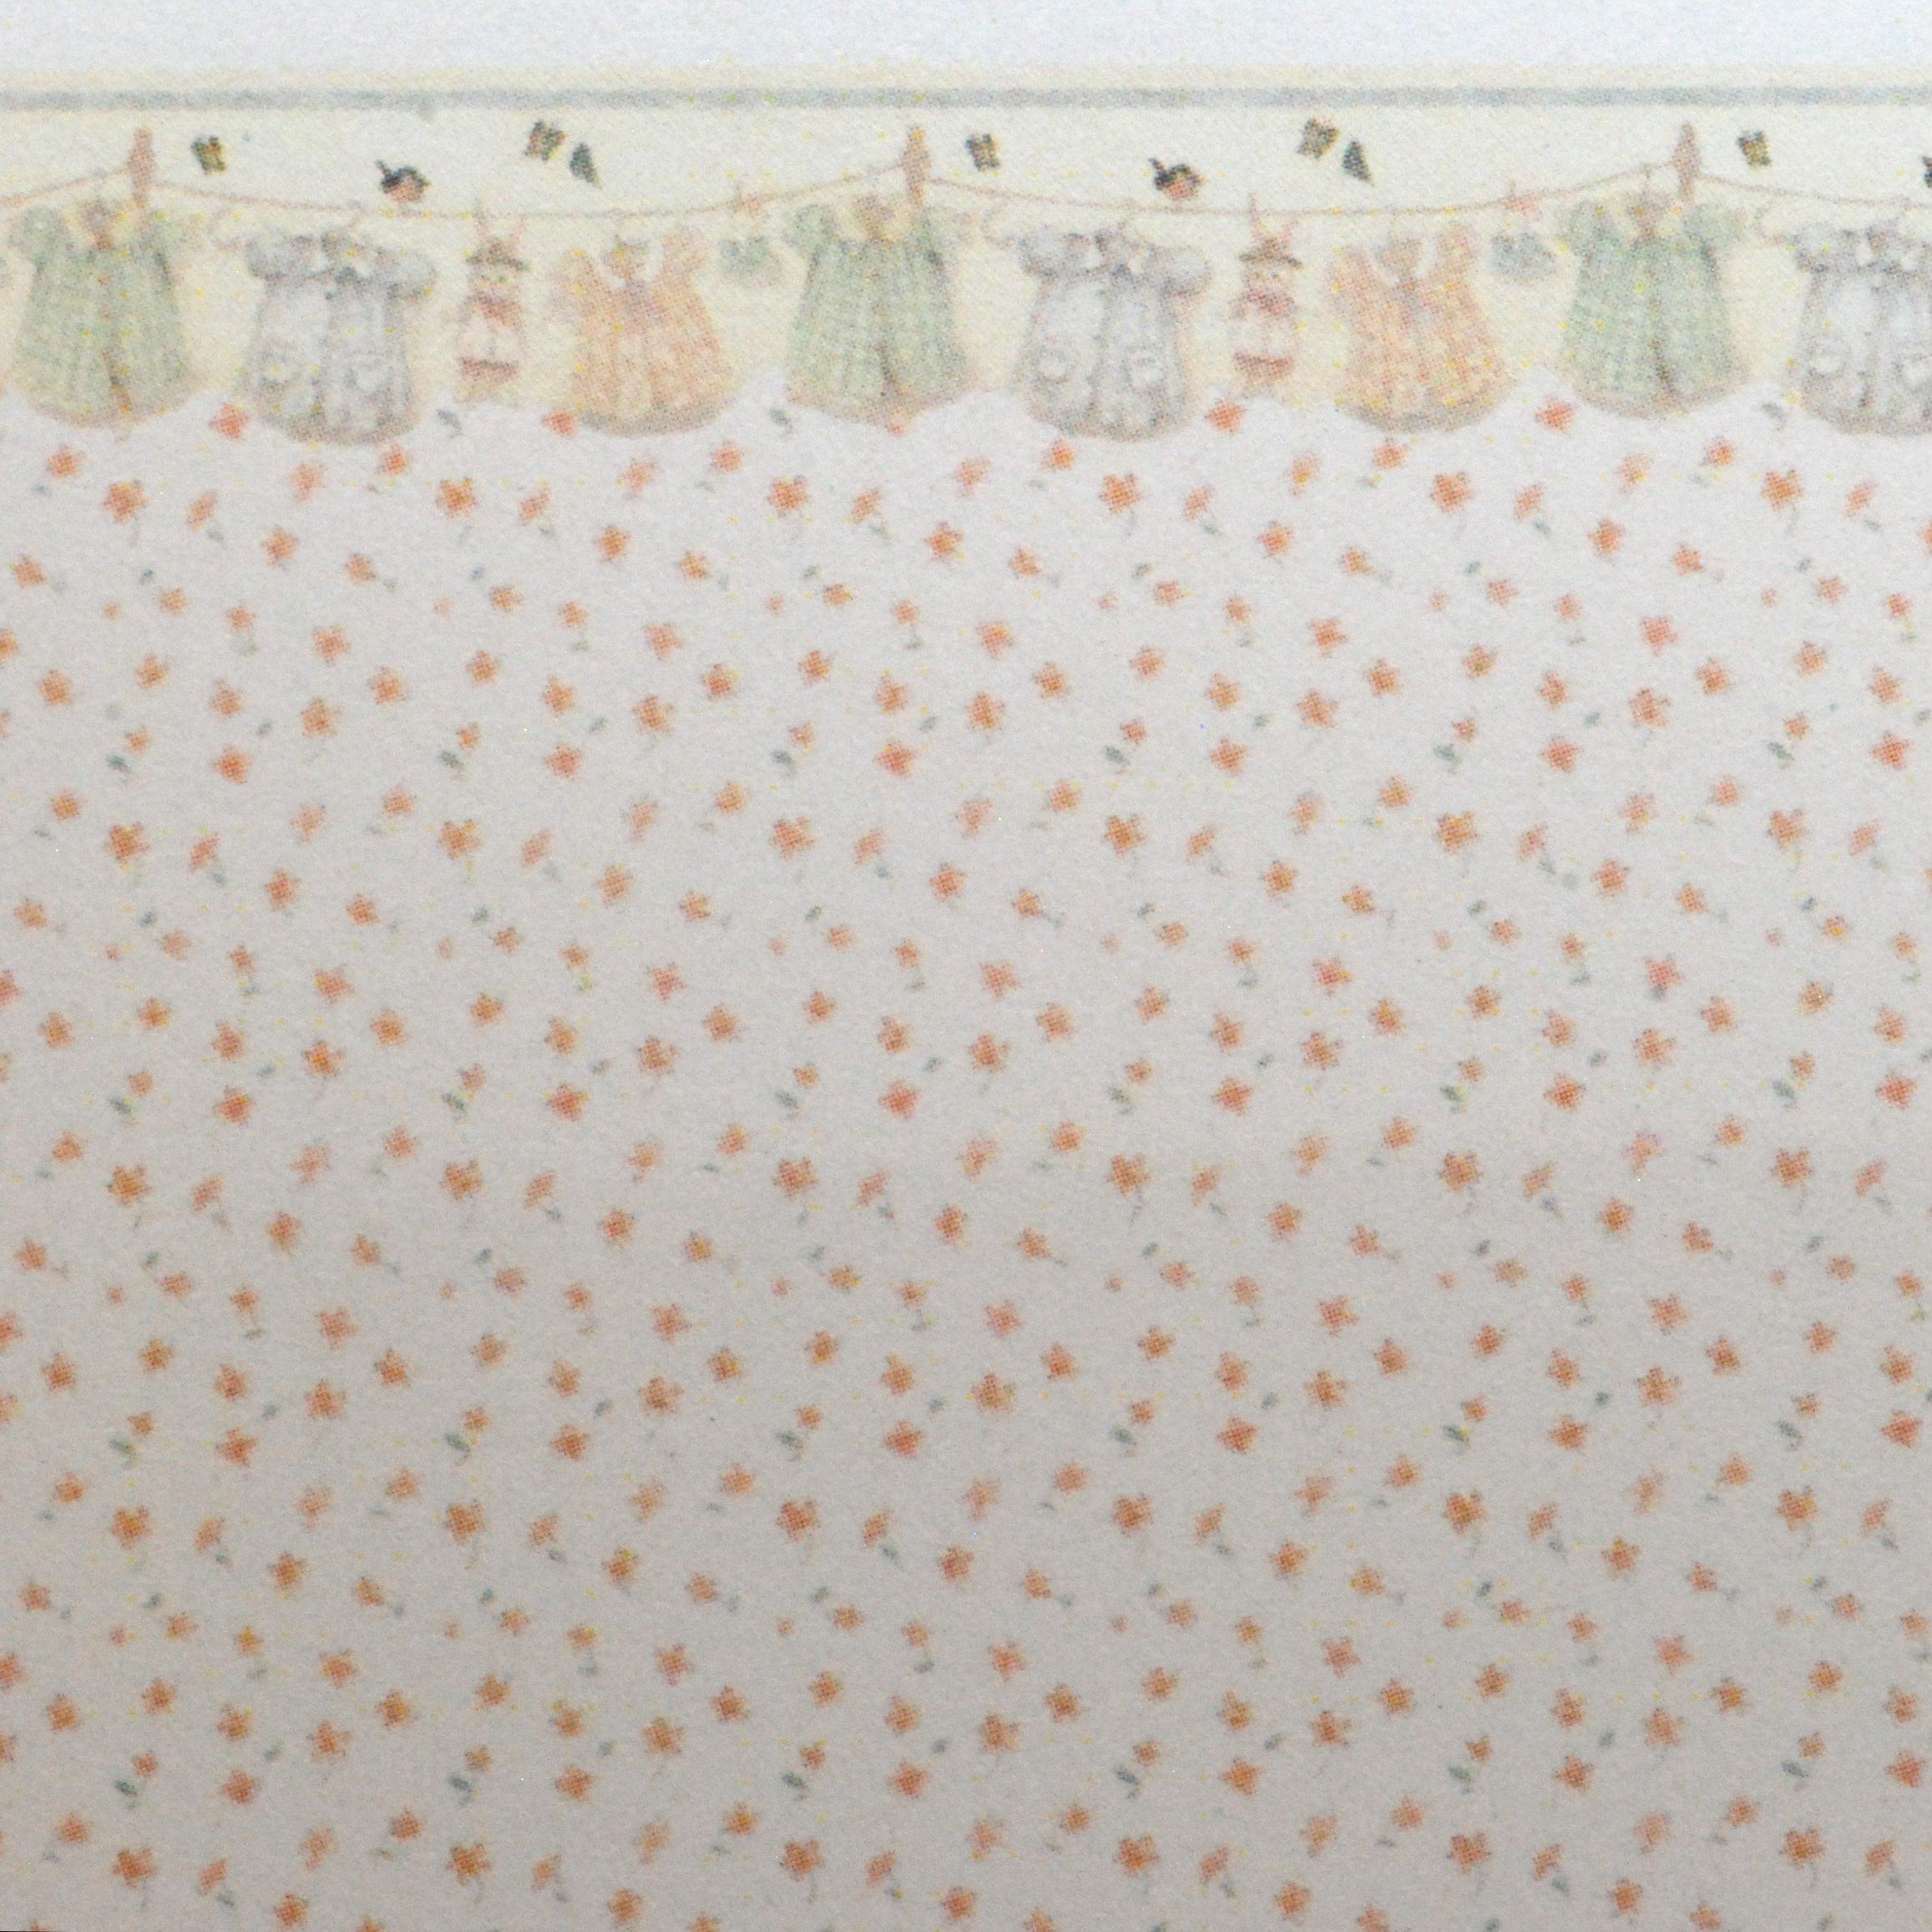 download 48 Wallpaper Baby Clothes Stewart Dollhouse 2314x2314